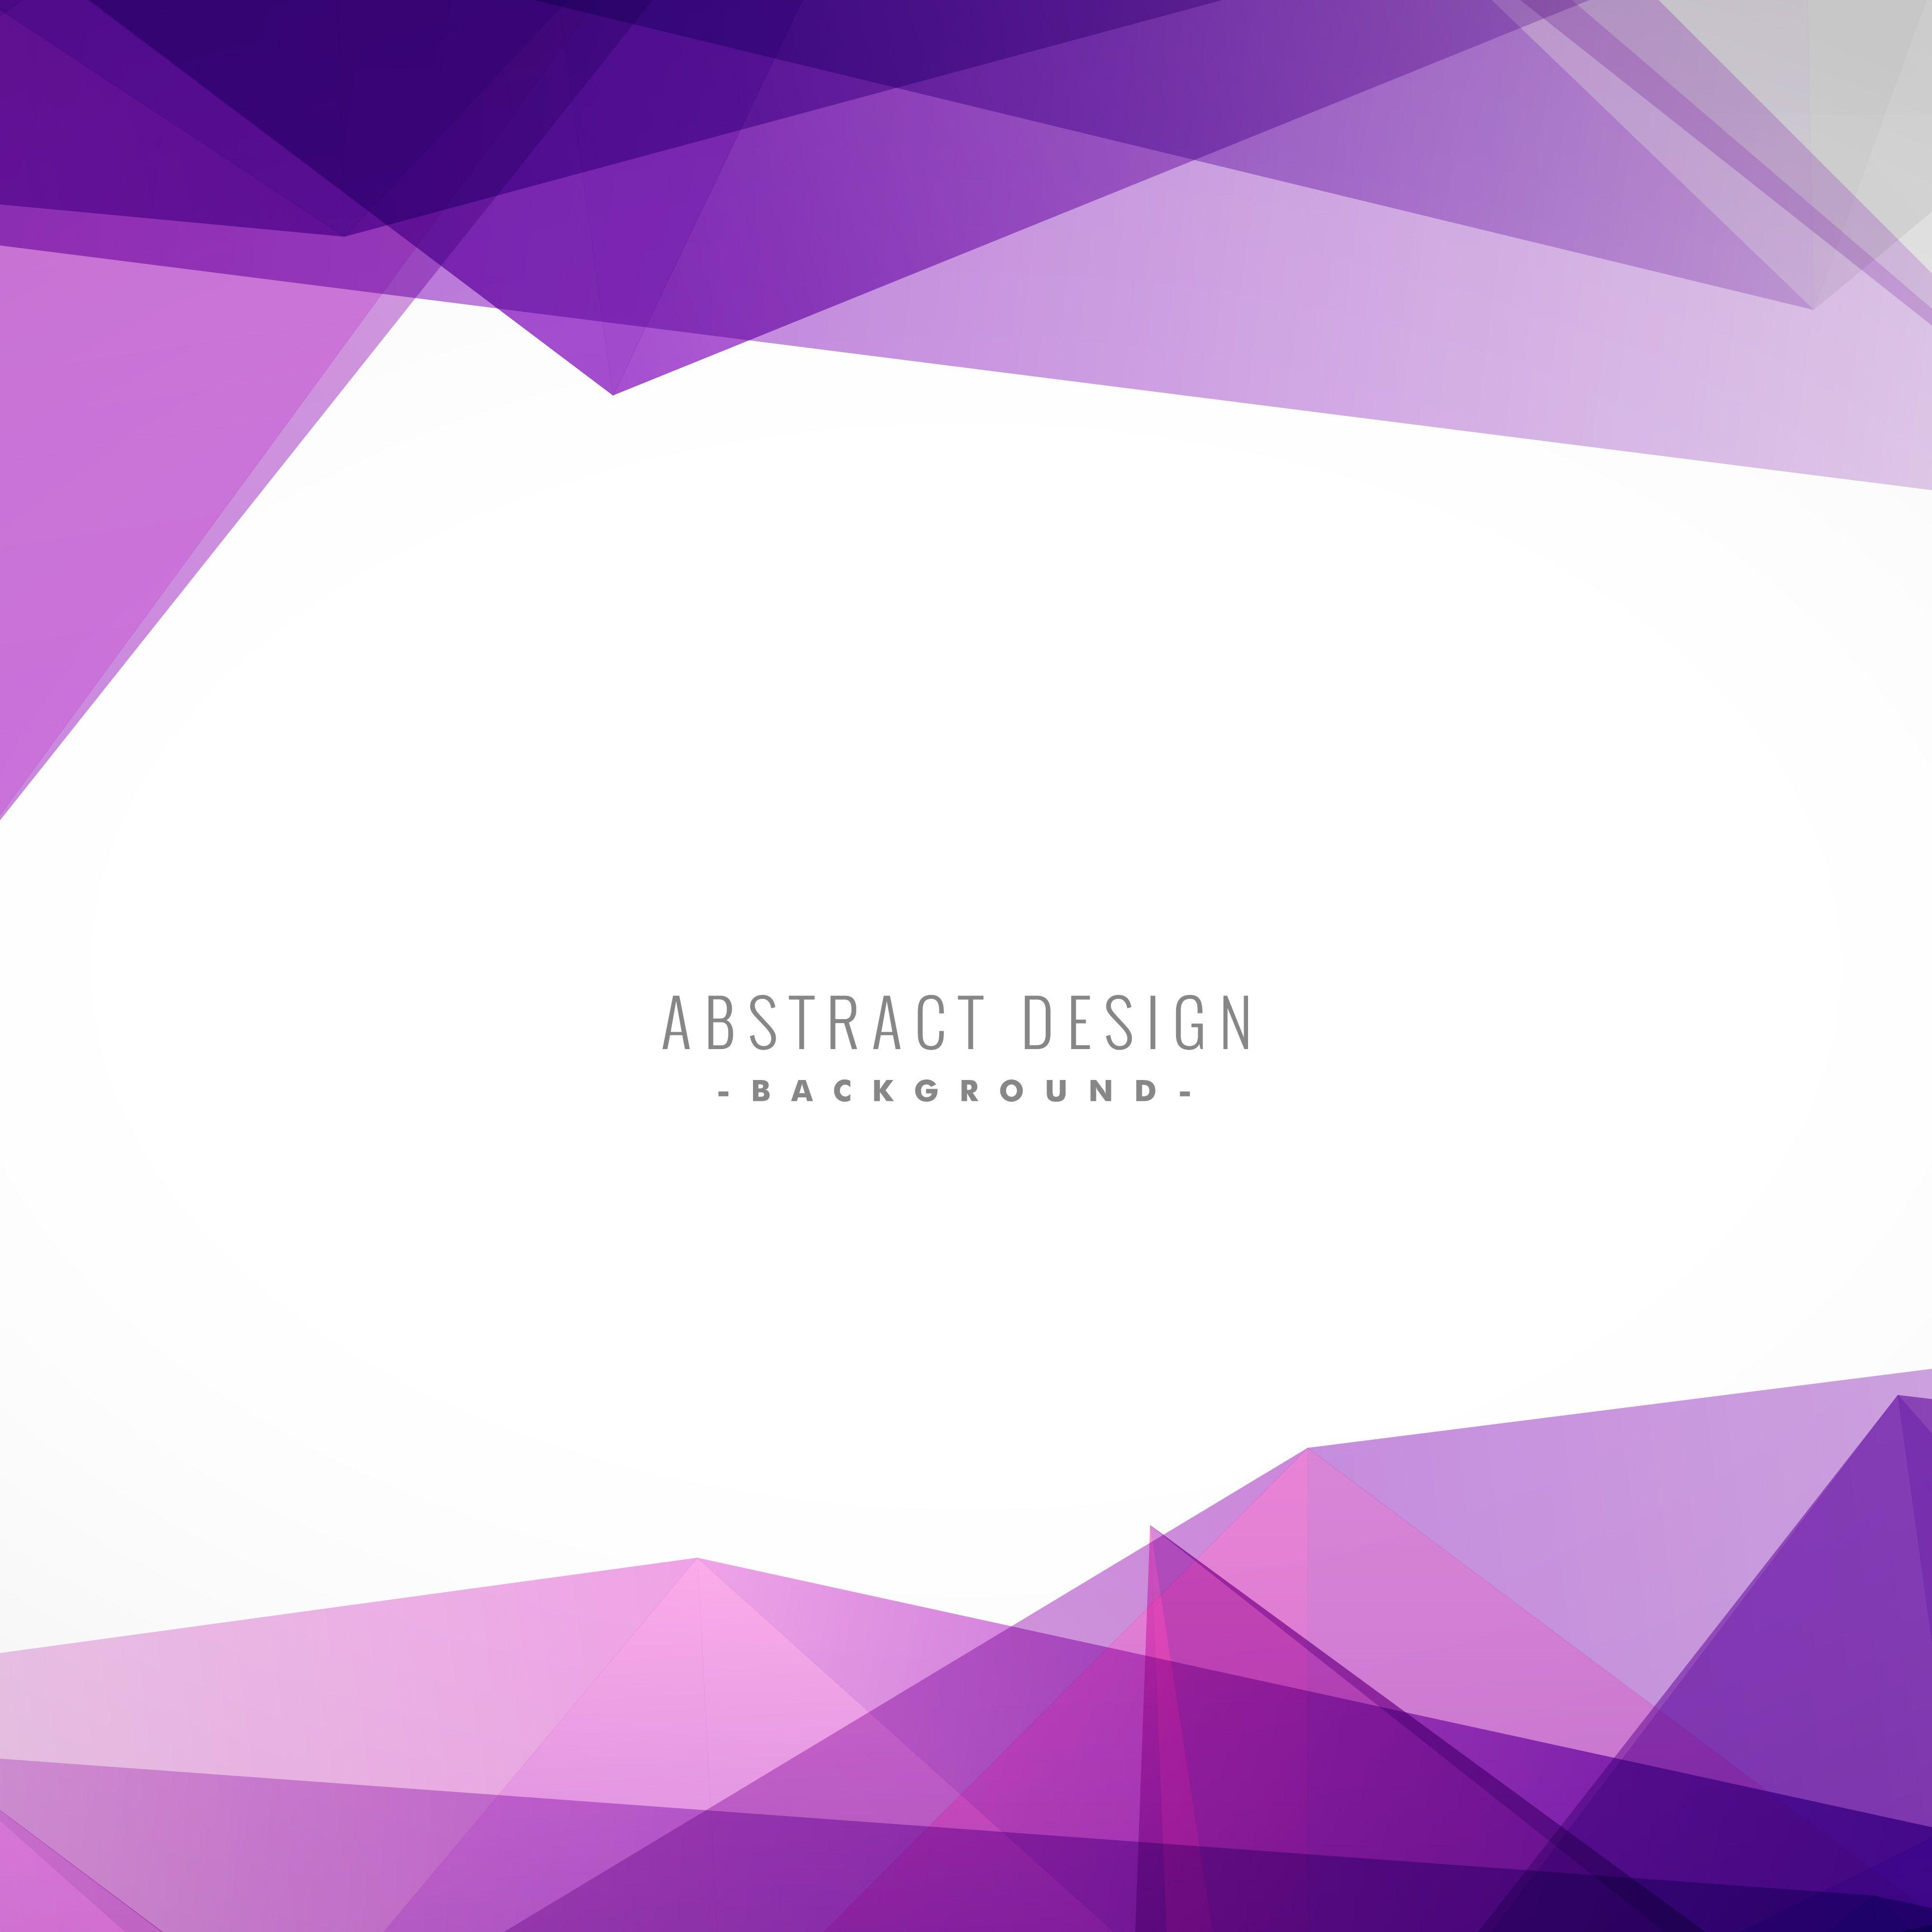 Background With Colorful Purple Shapes Desain Poster Desain Banner Brosur